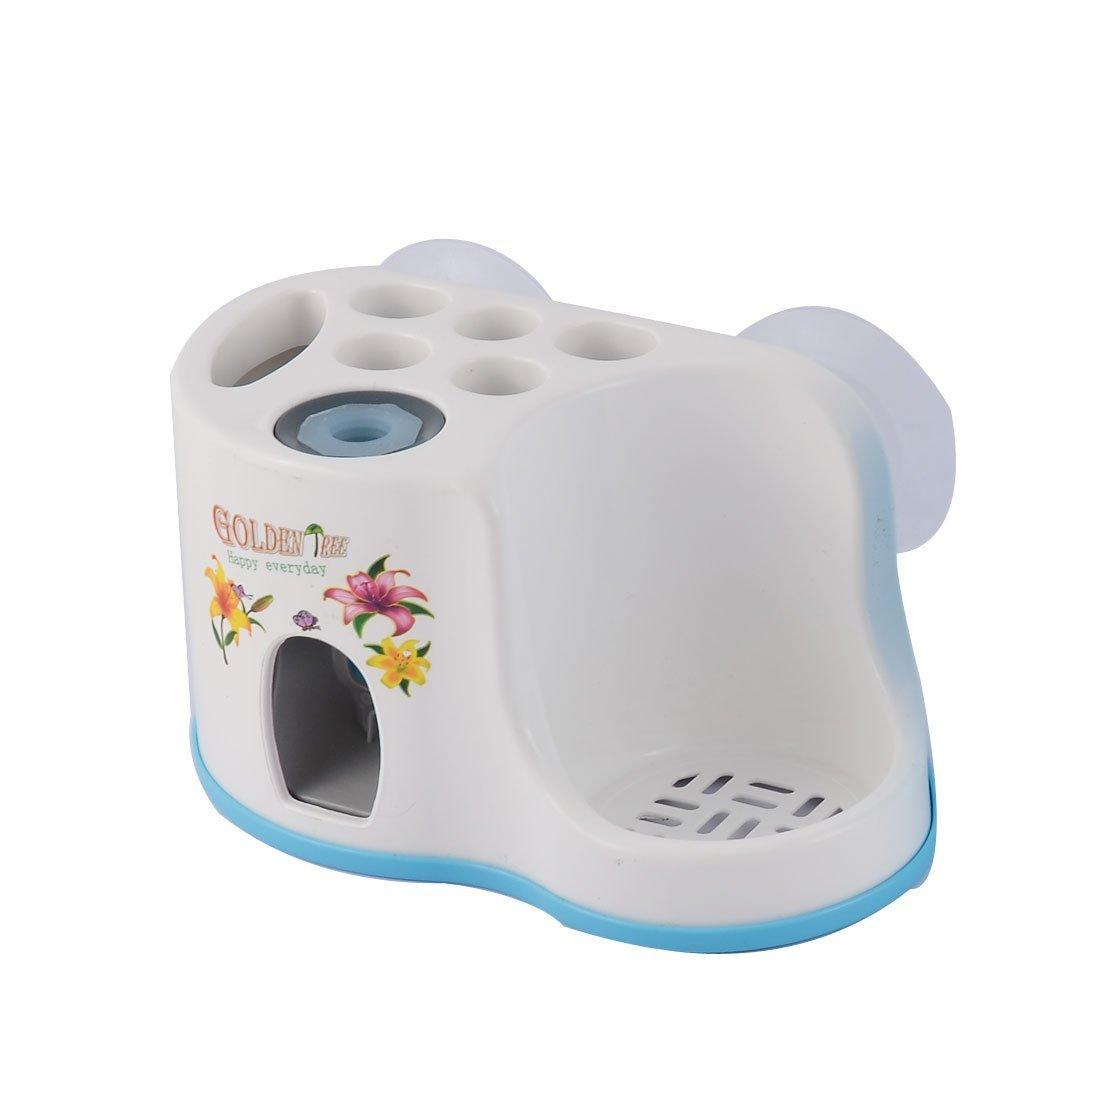 Amazon.com: eDealMax plástico de baño automático dispensador de Pasta de dientes cepillo de dientes están w Taza Azul: Home & Kitchen